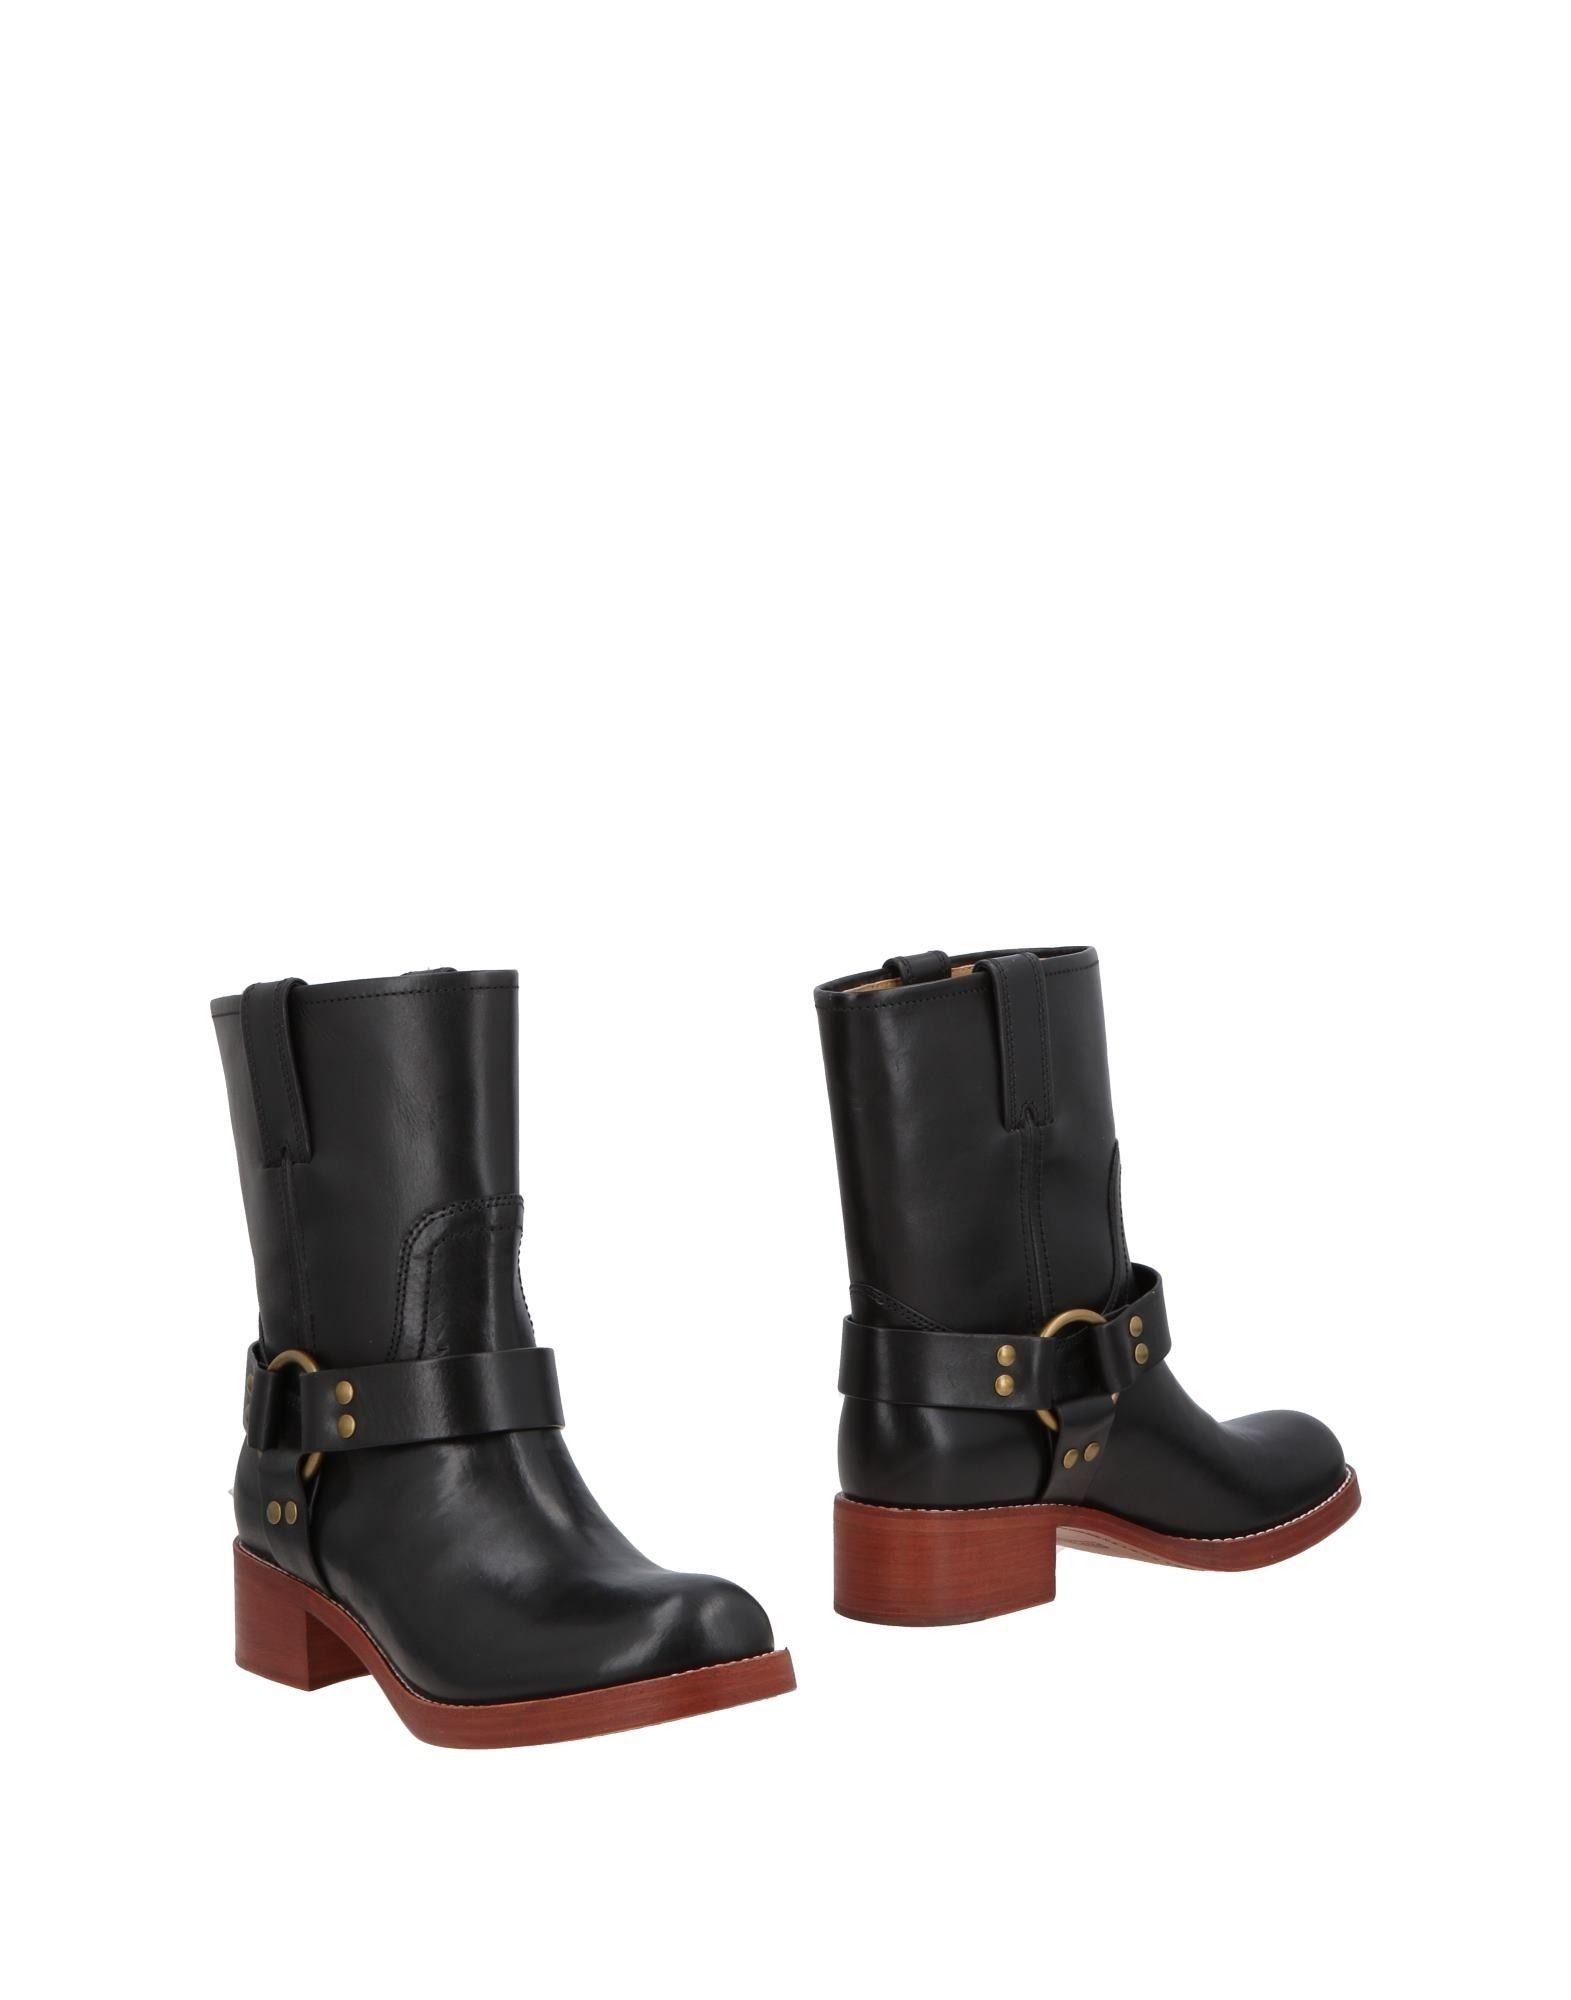 Marc Jacobs Stiefelette Schuhe Damen  11500989HT Neue Schuhe Stiefelette 1b5f63